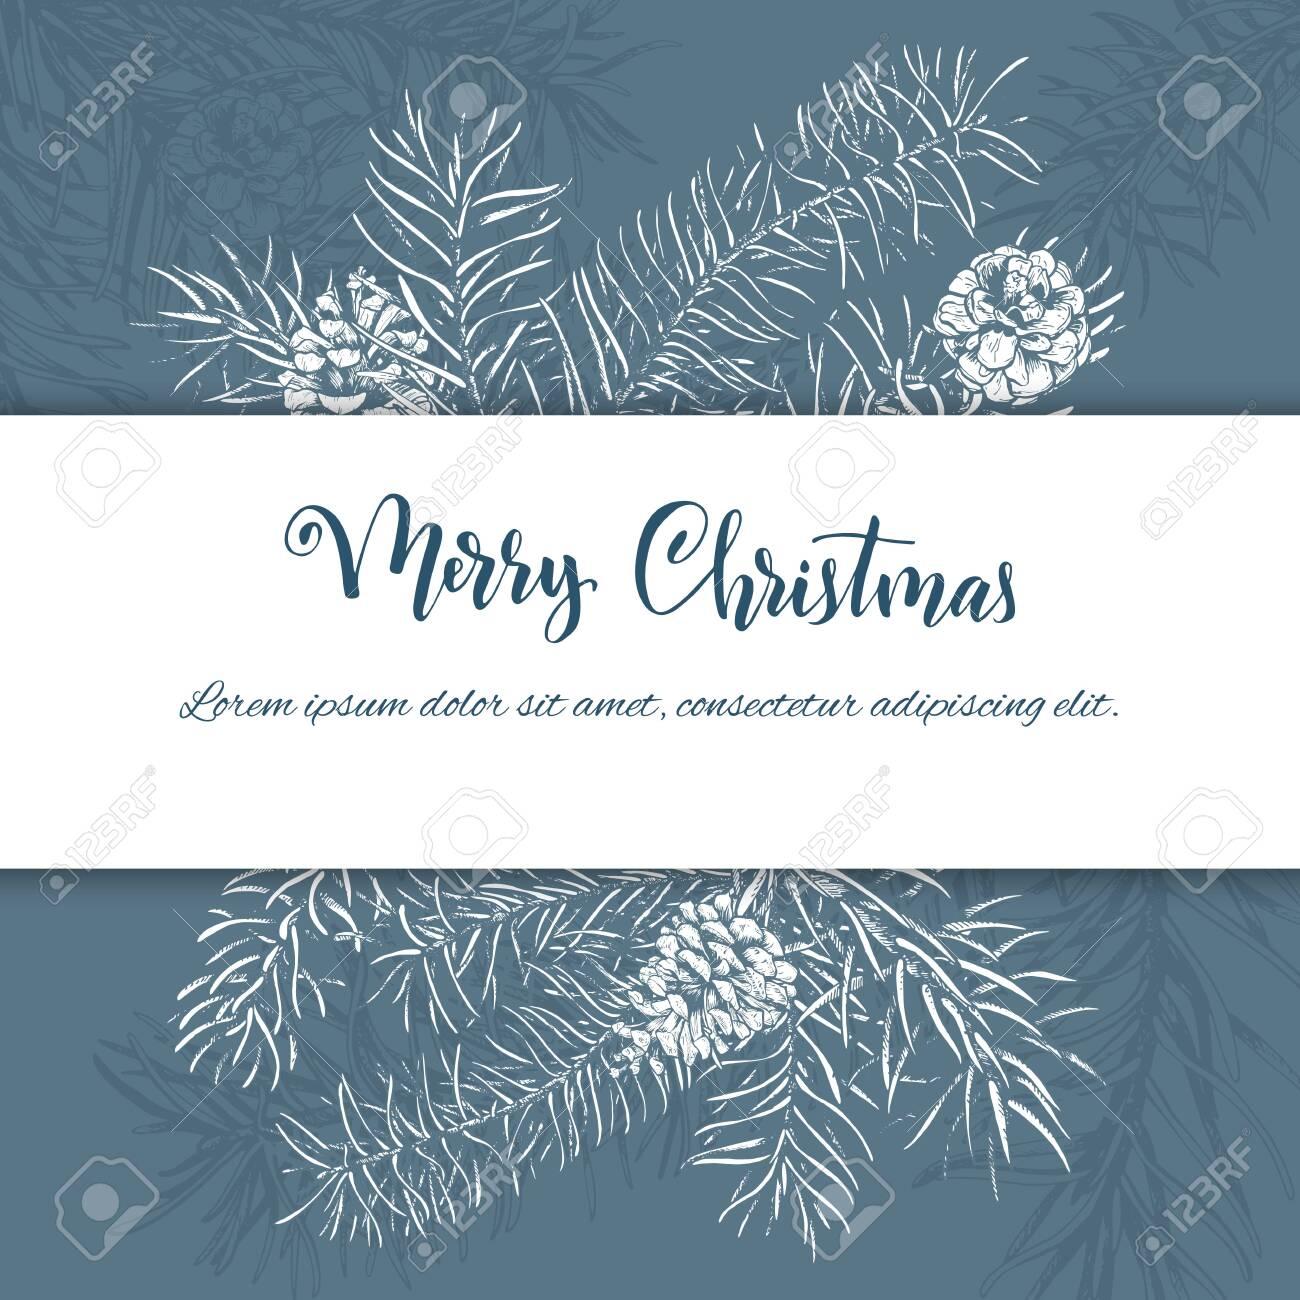 Christmas sketch hand drawn illustration - 131653455